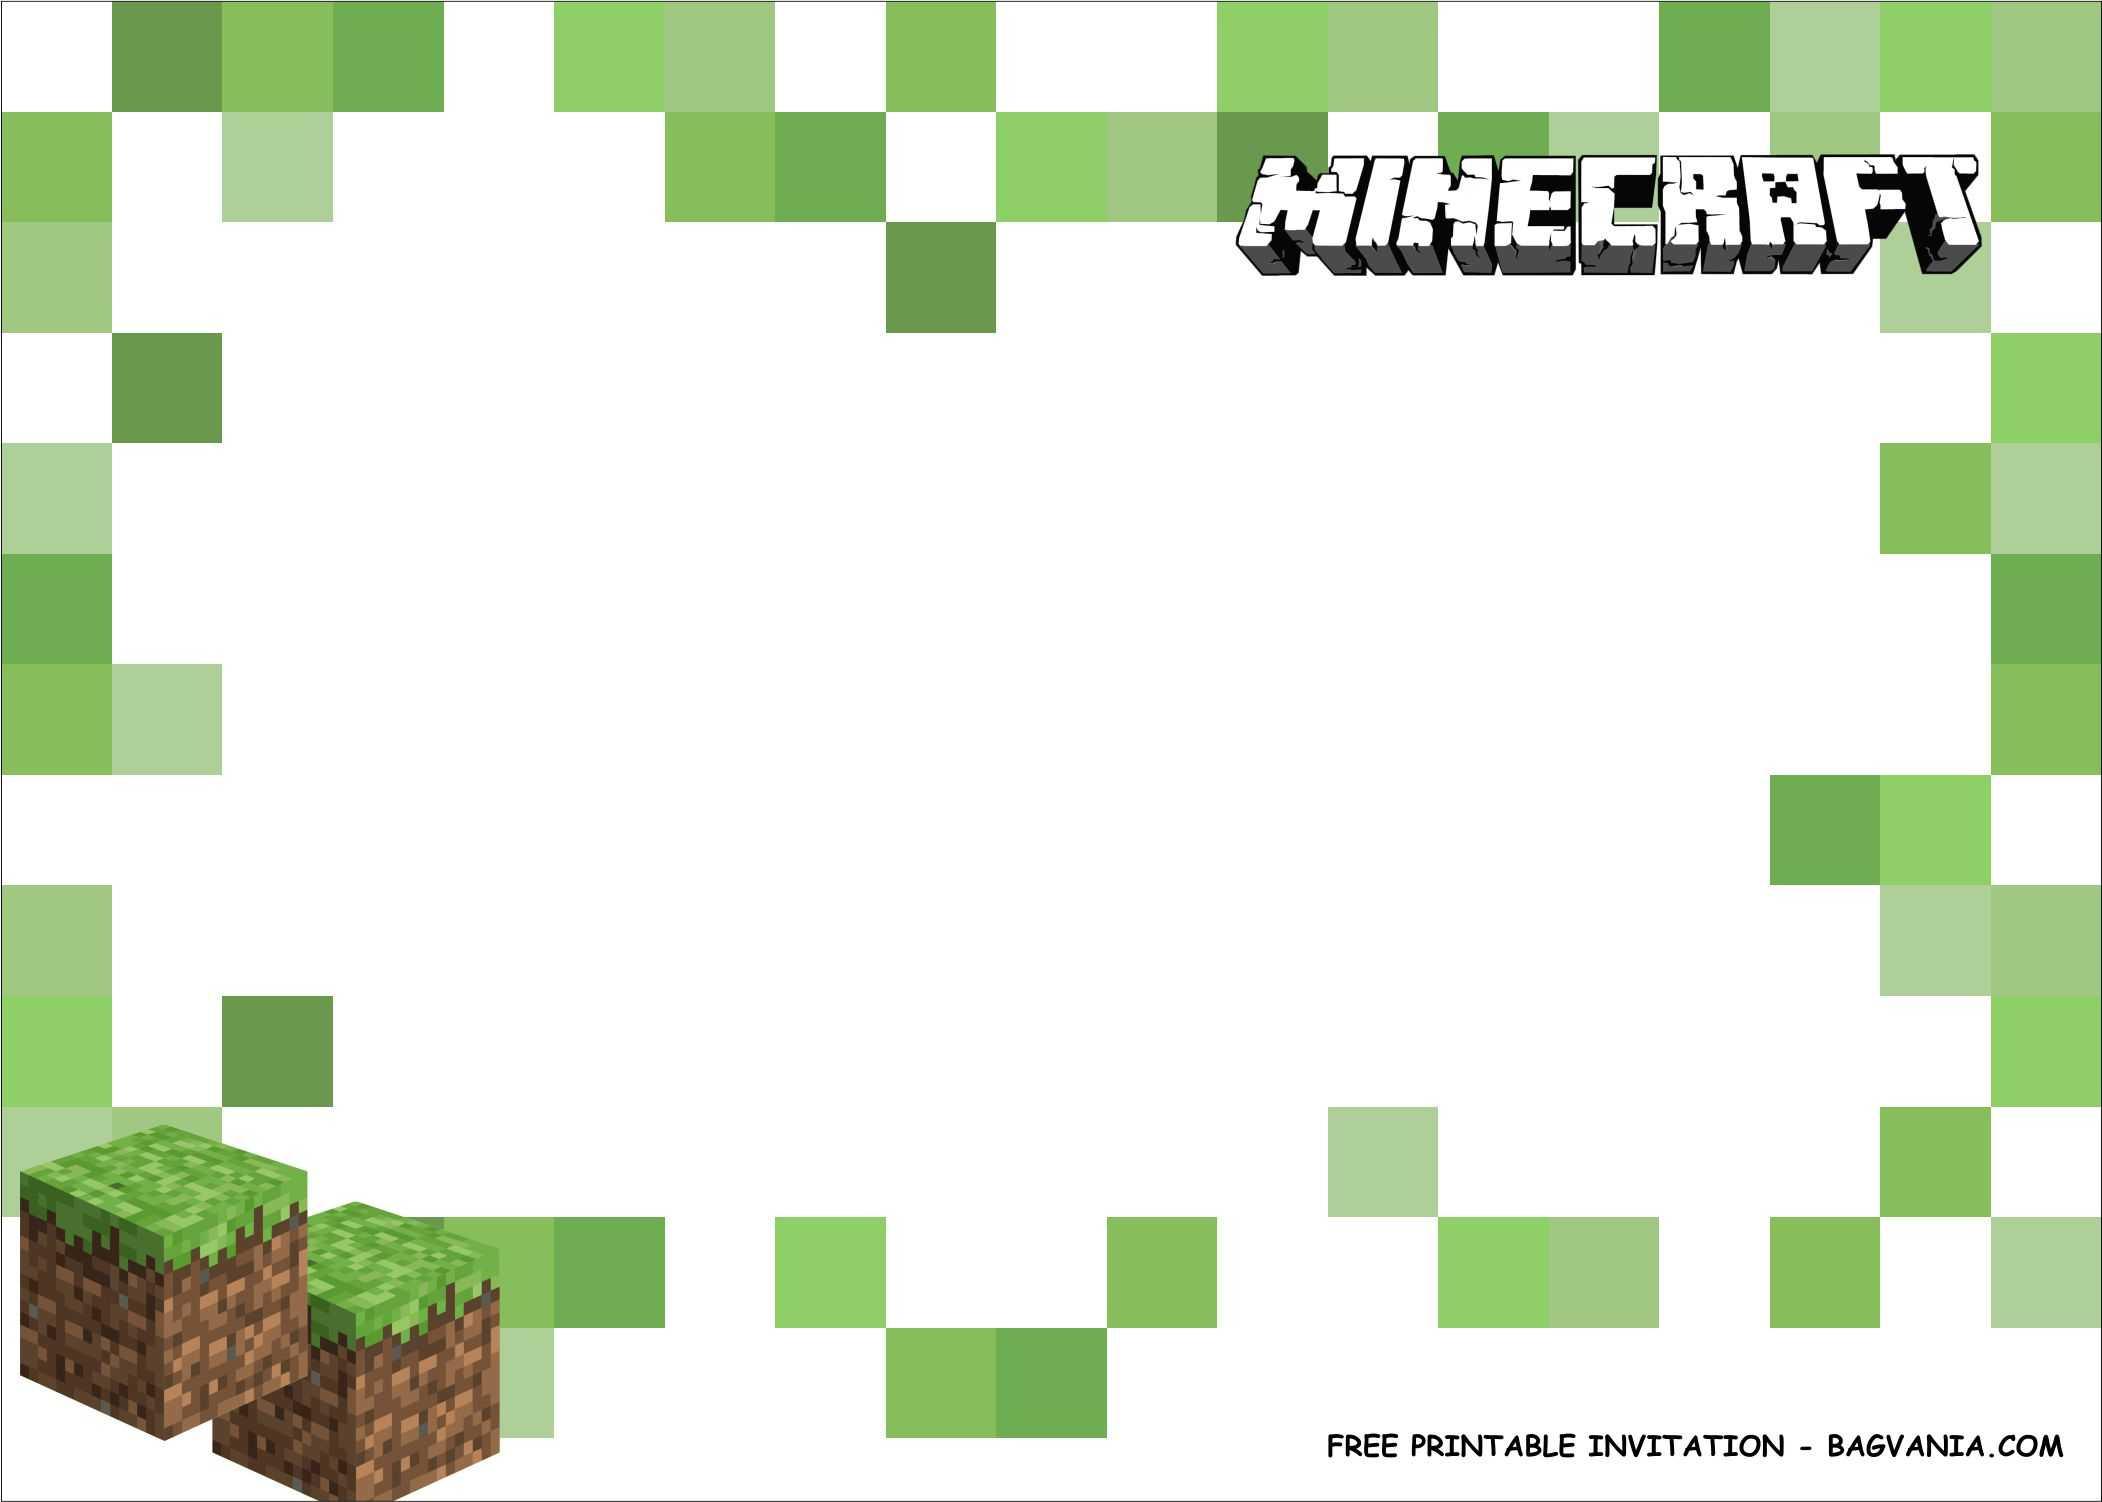 Free Printable) - Minecraft Birthday Party Kits Template For Minecraft Birthday Card Template